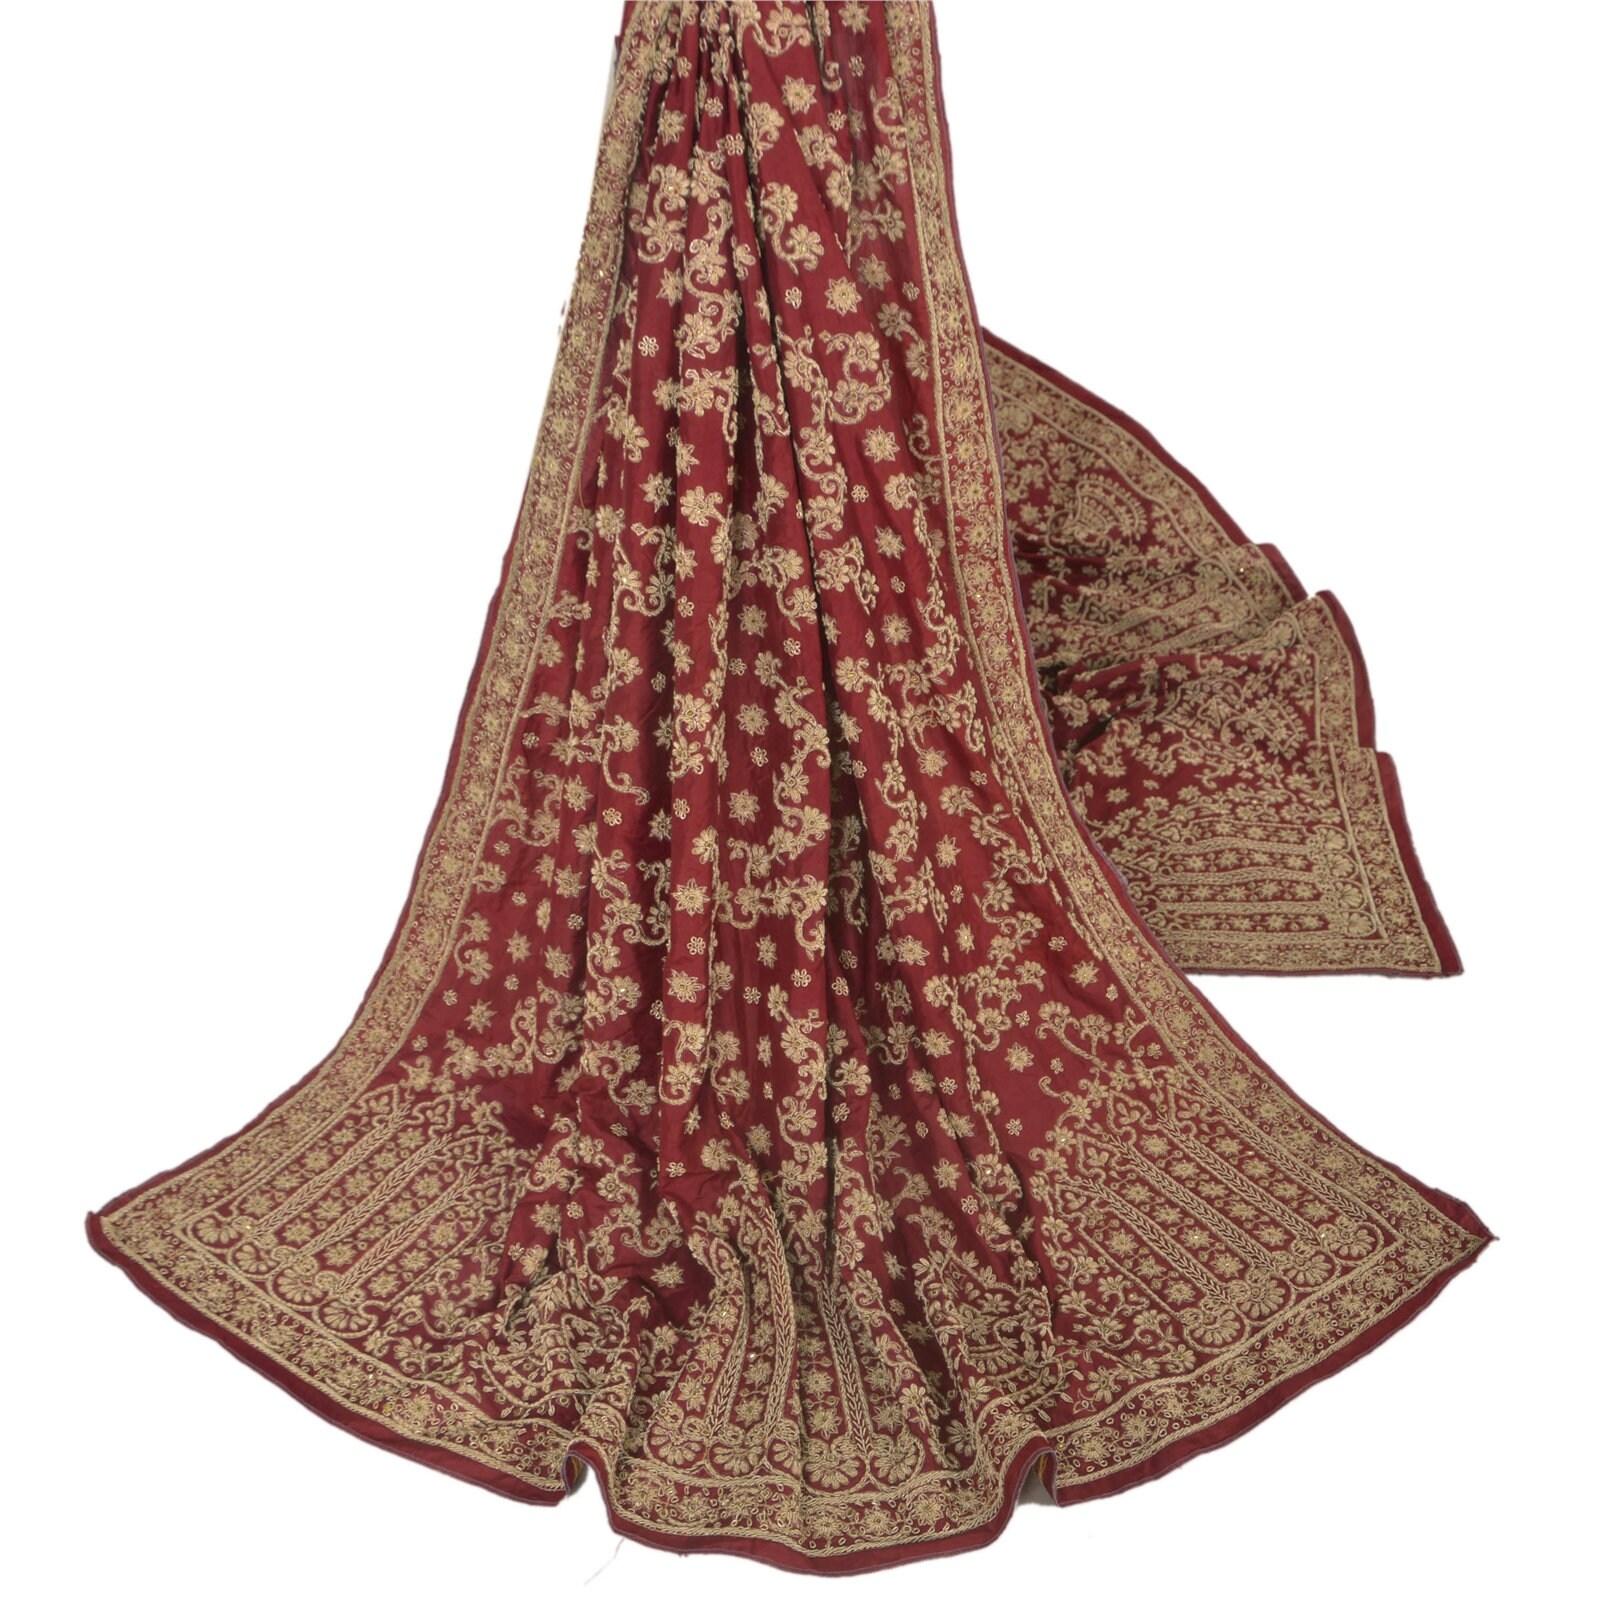 KK KK KK Vintage Dark Red Heavy Dupatta Pure Silk Fabric Stole Hand Beaded d47b68